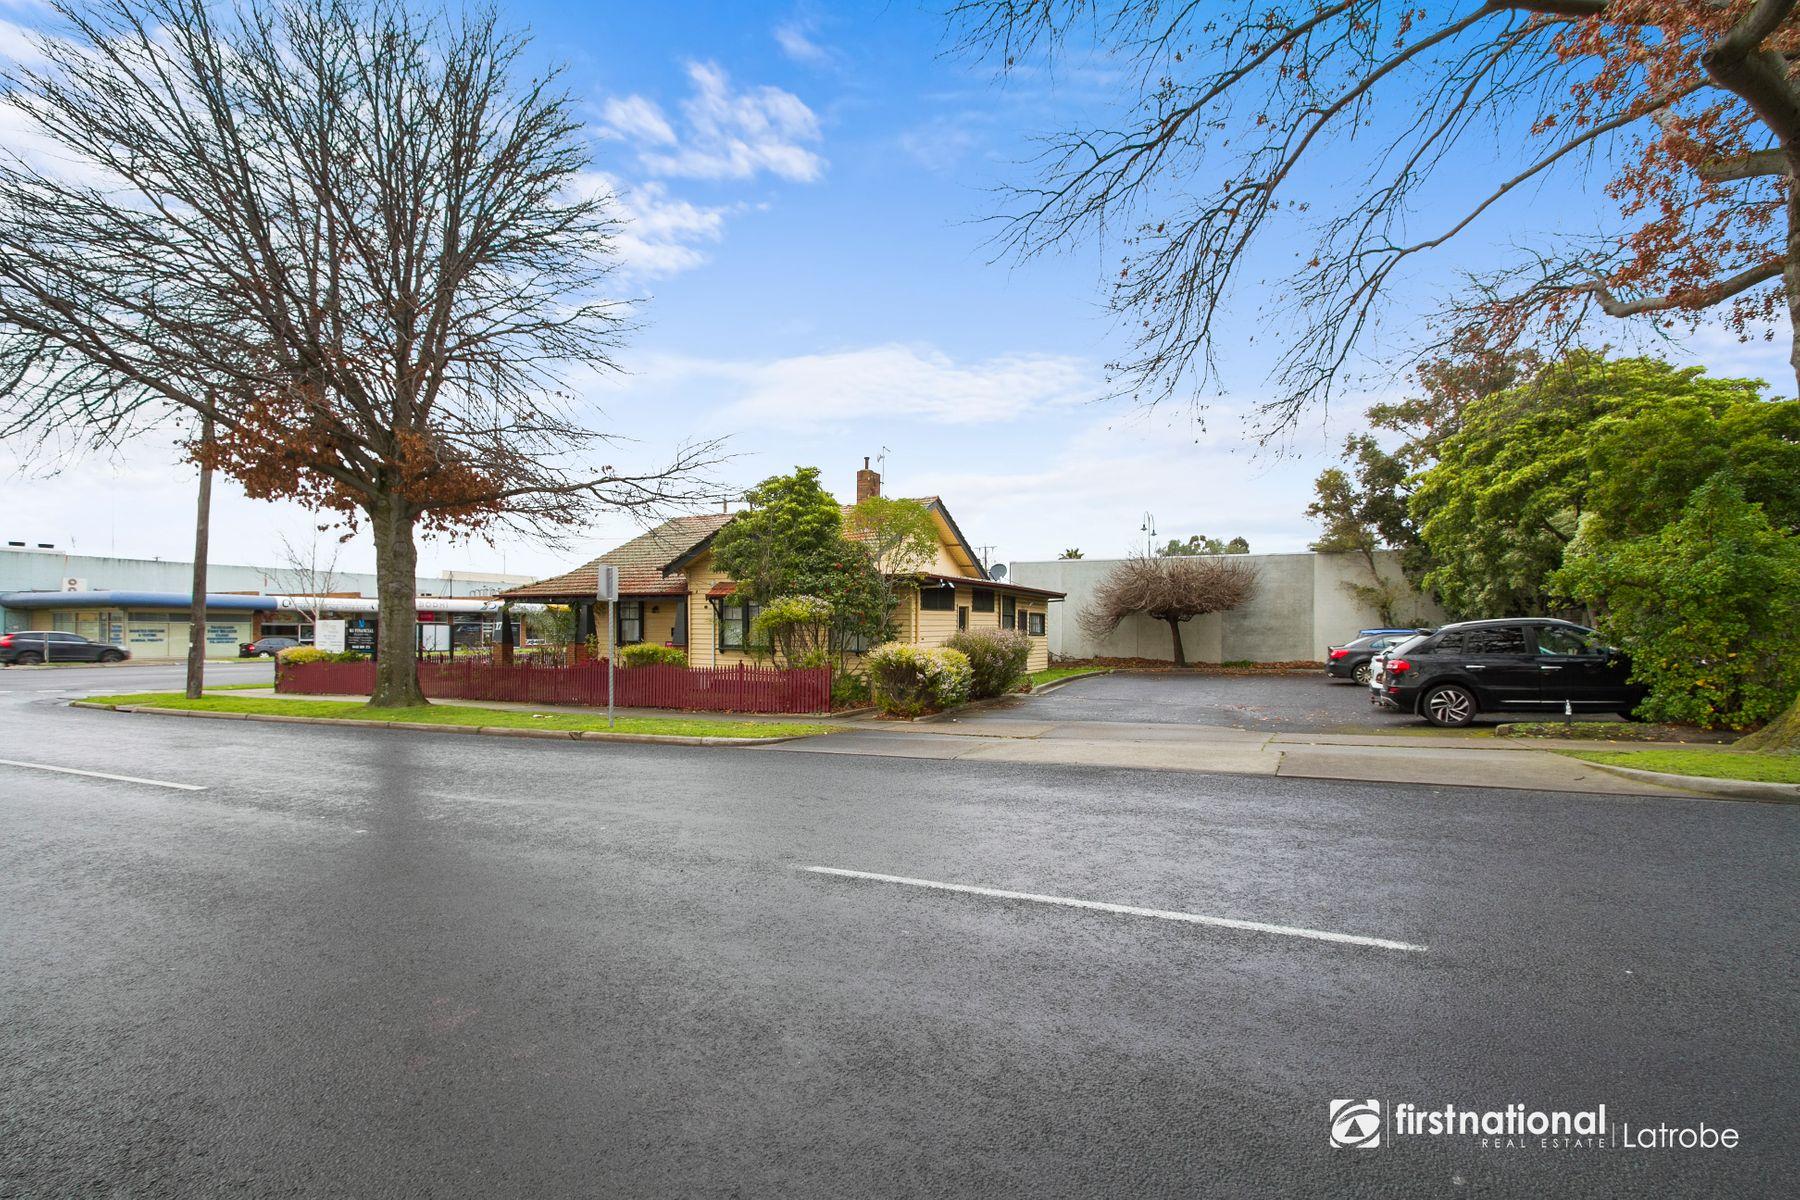 17 Breed Street, Traralgon, VIC 3844